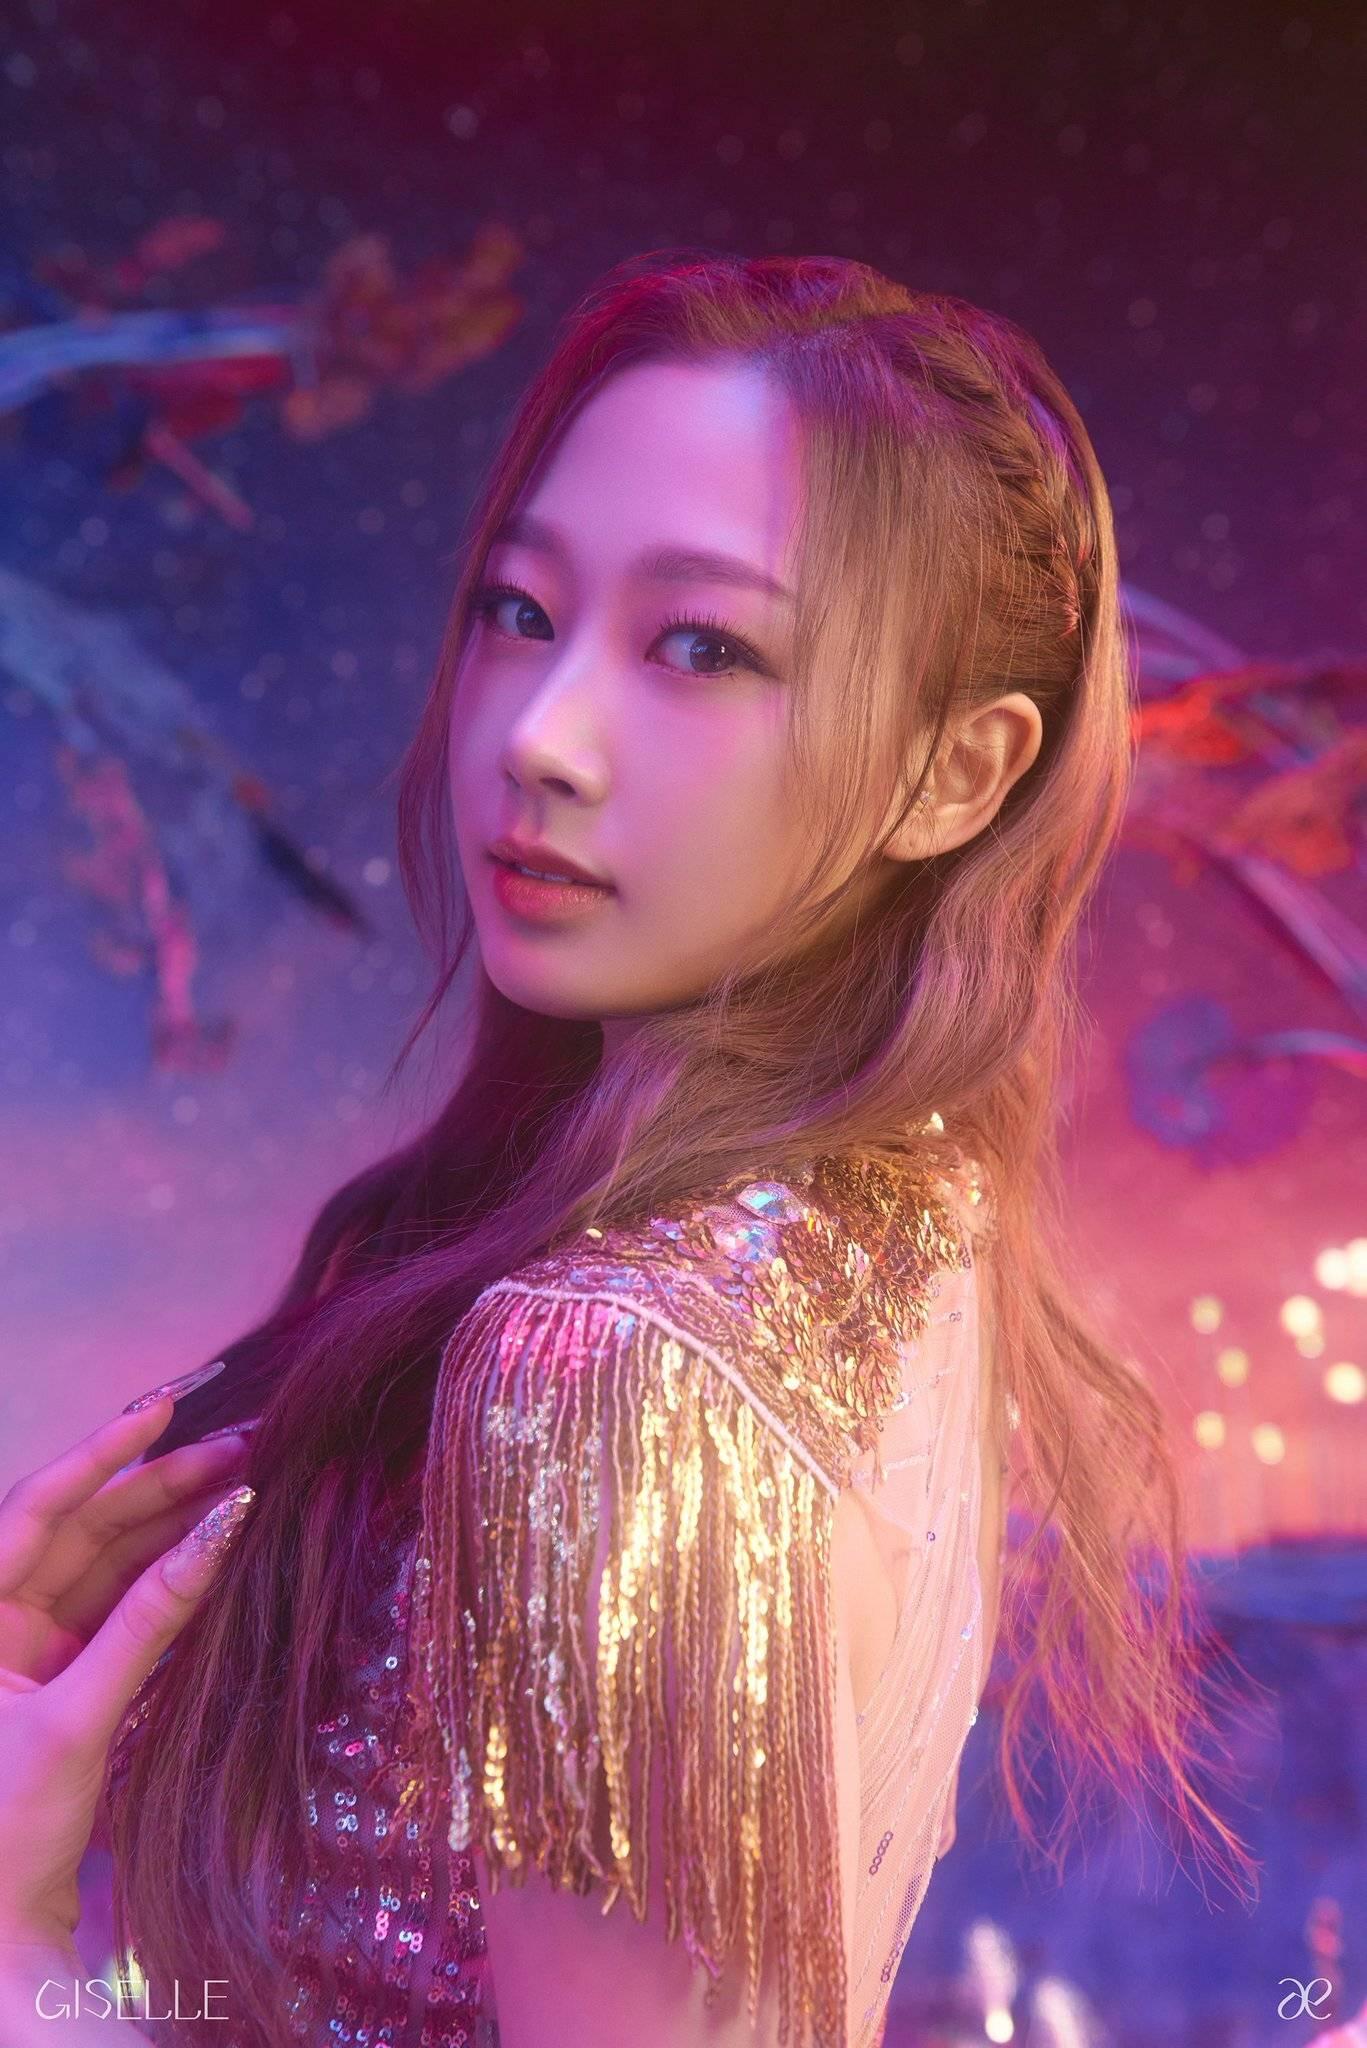 SM 신인 걸그룹 '에스파' 4번째 멤버 지젤 (애리 우치나가) 공개.jpg | 인스티즈